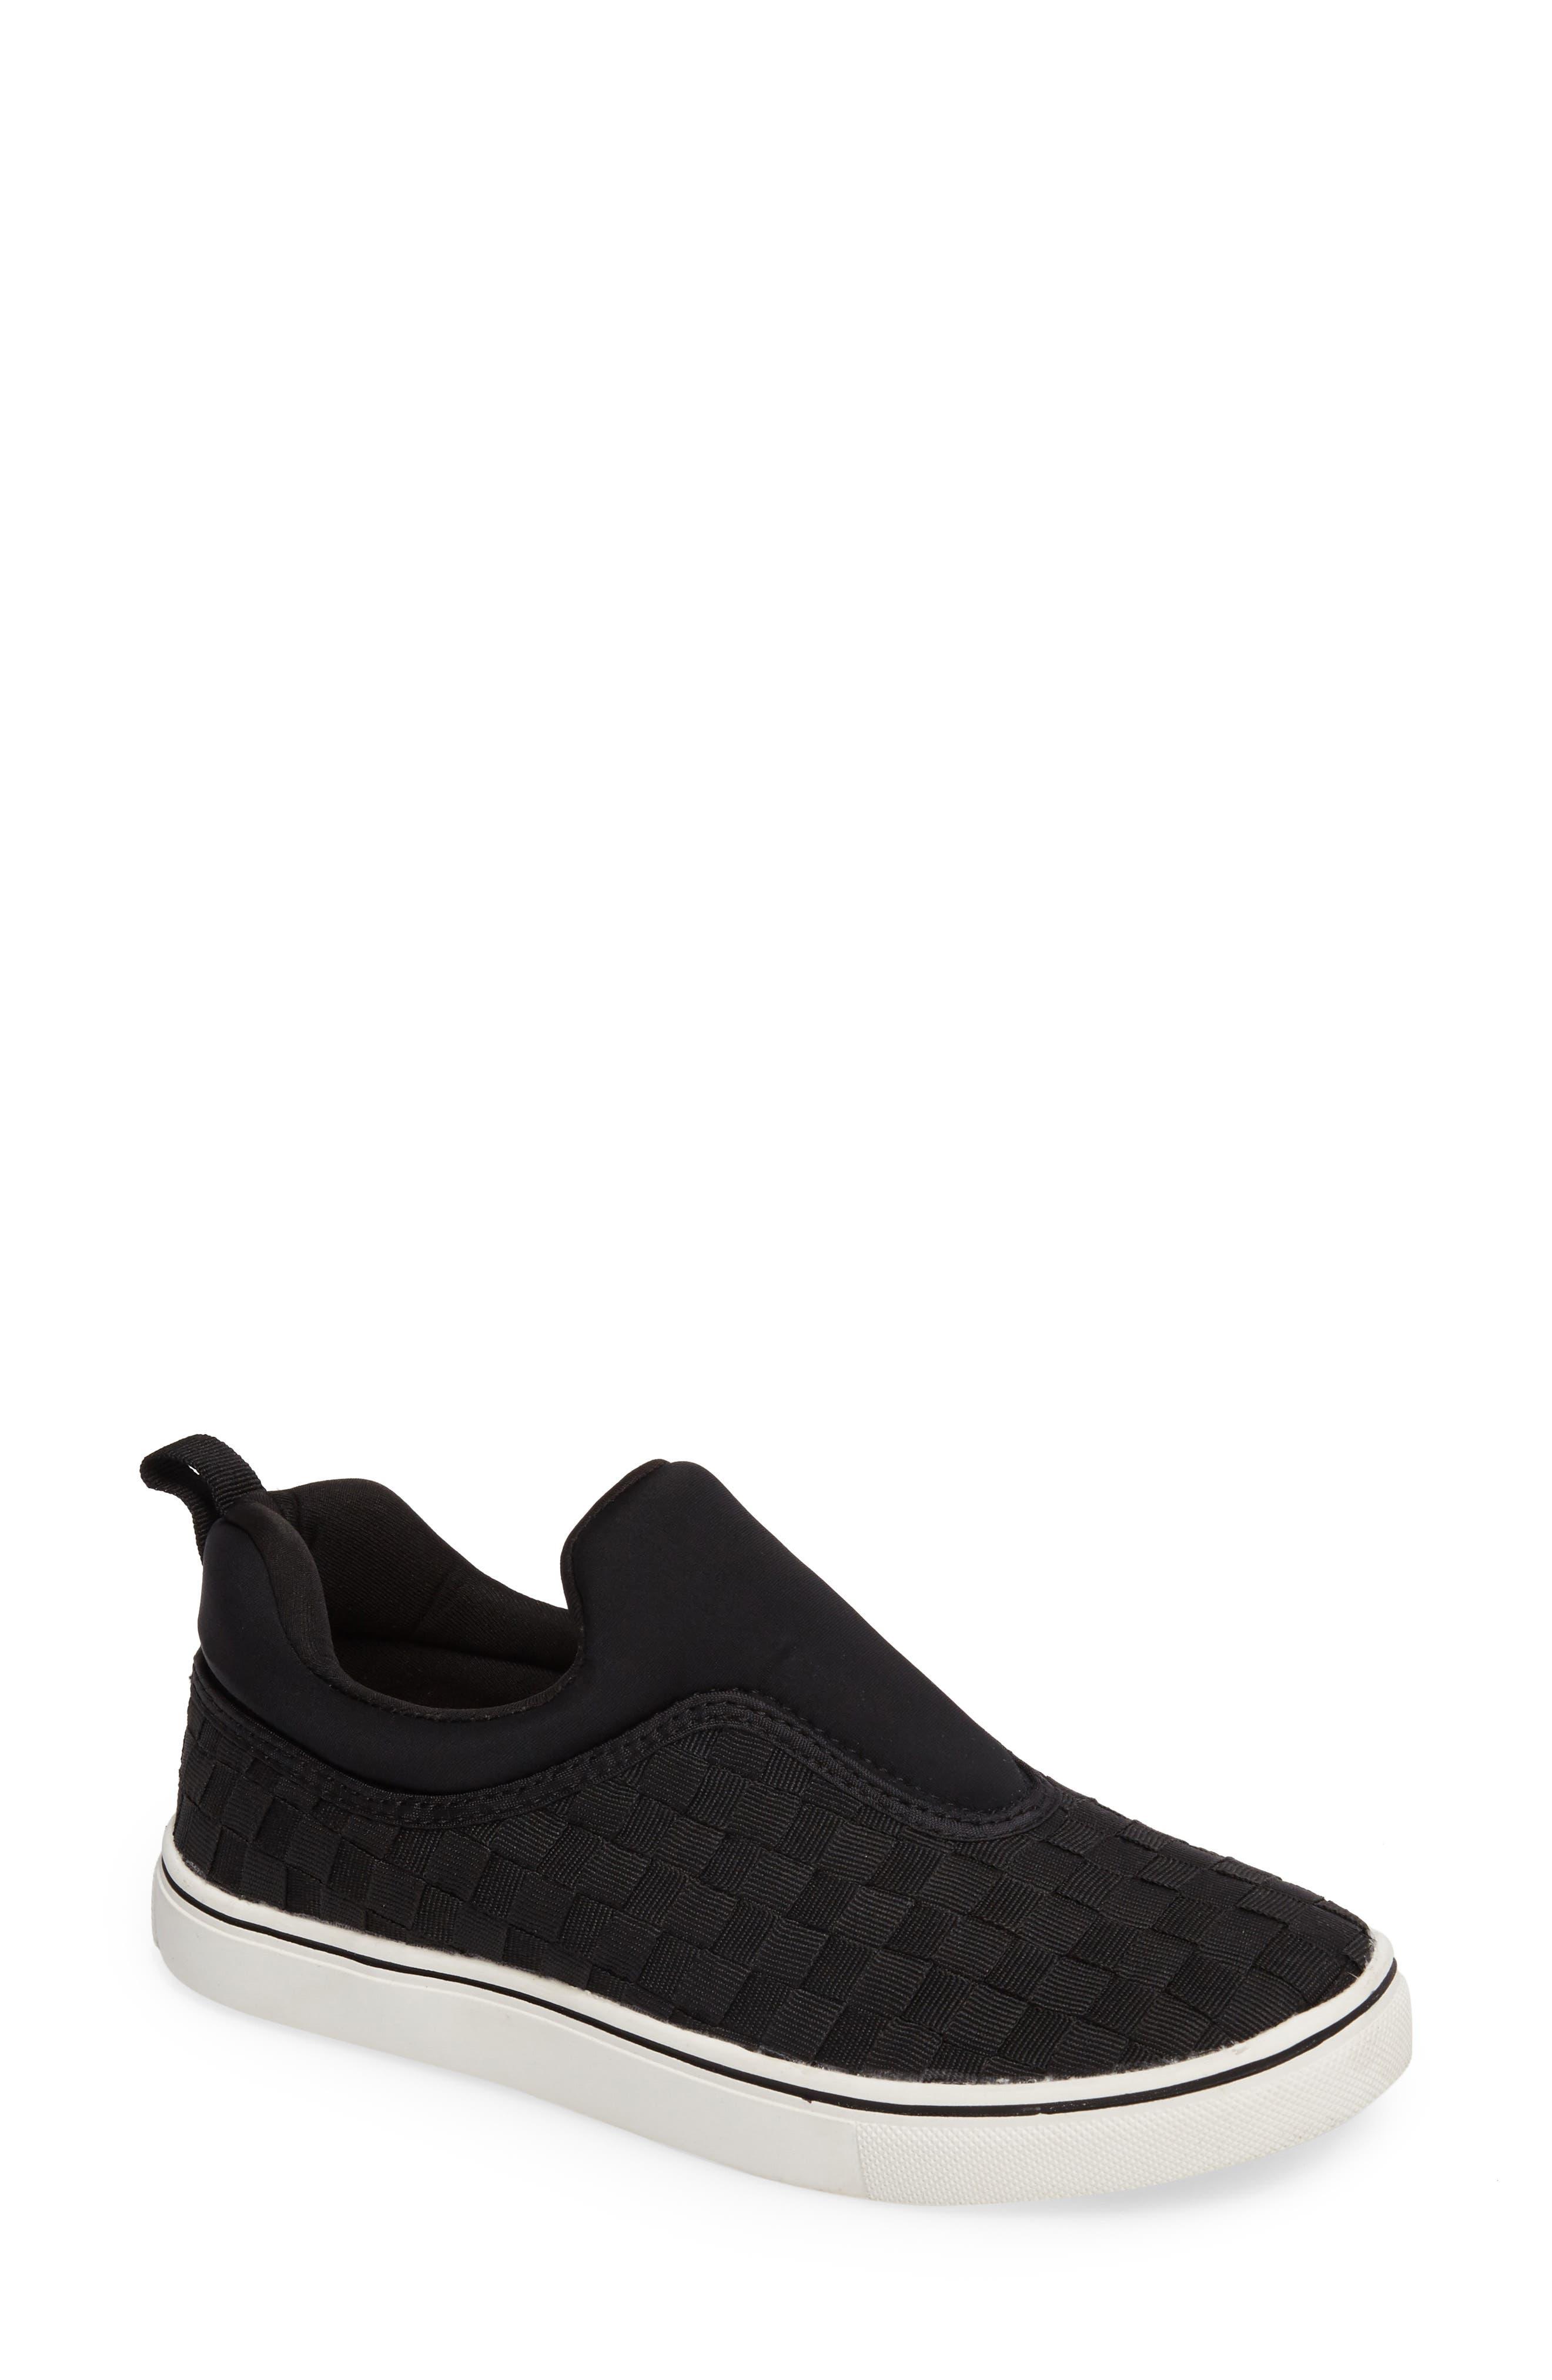 Bernie Mev Joan Slip-On Sneaker,                             Main thumbnail 1, color,                             BLACK/ BLACK FABRIC